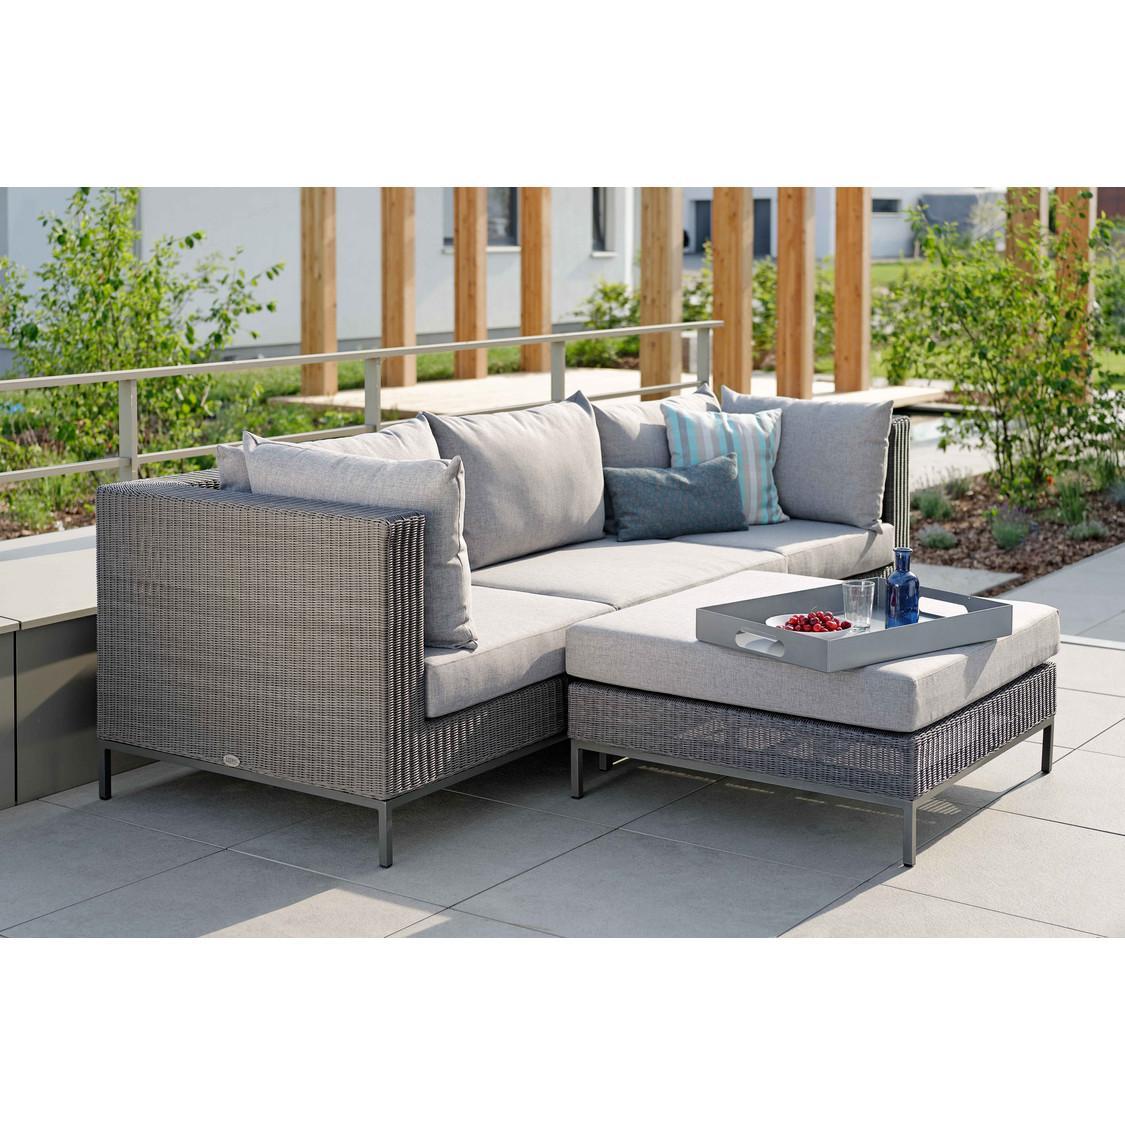 Stern Gartenmöbel Lounge